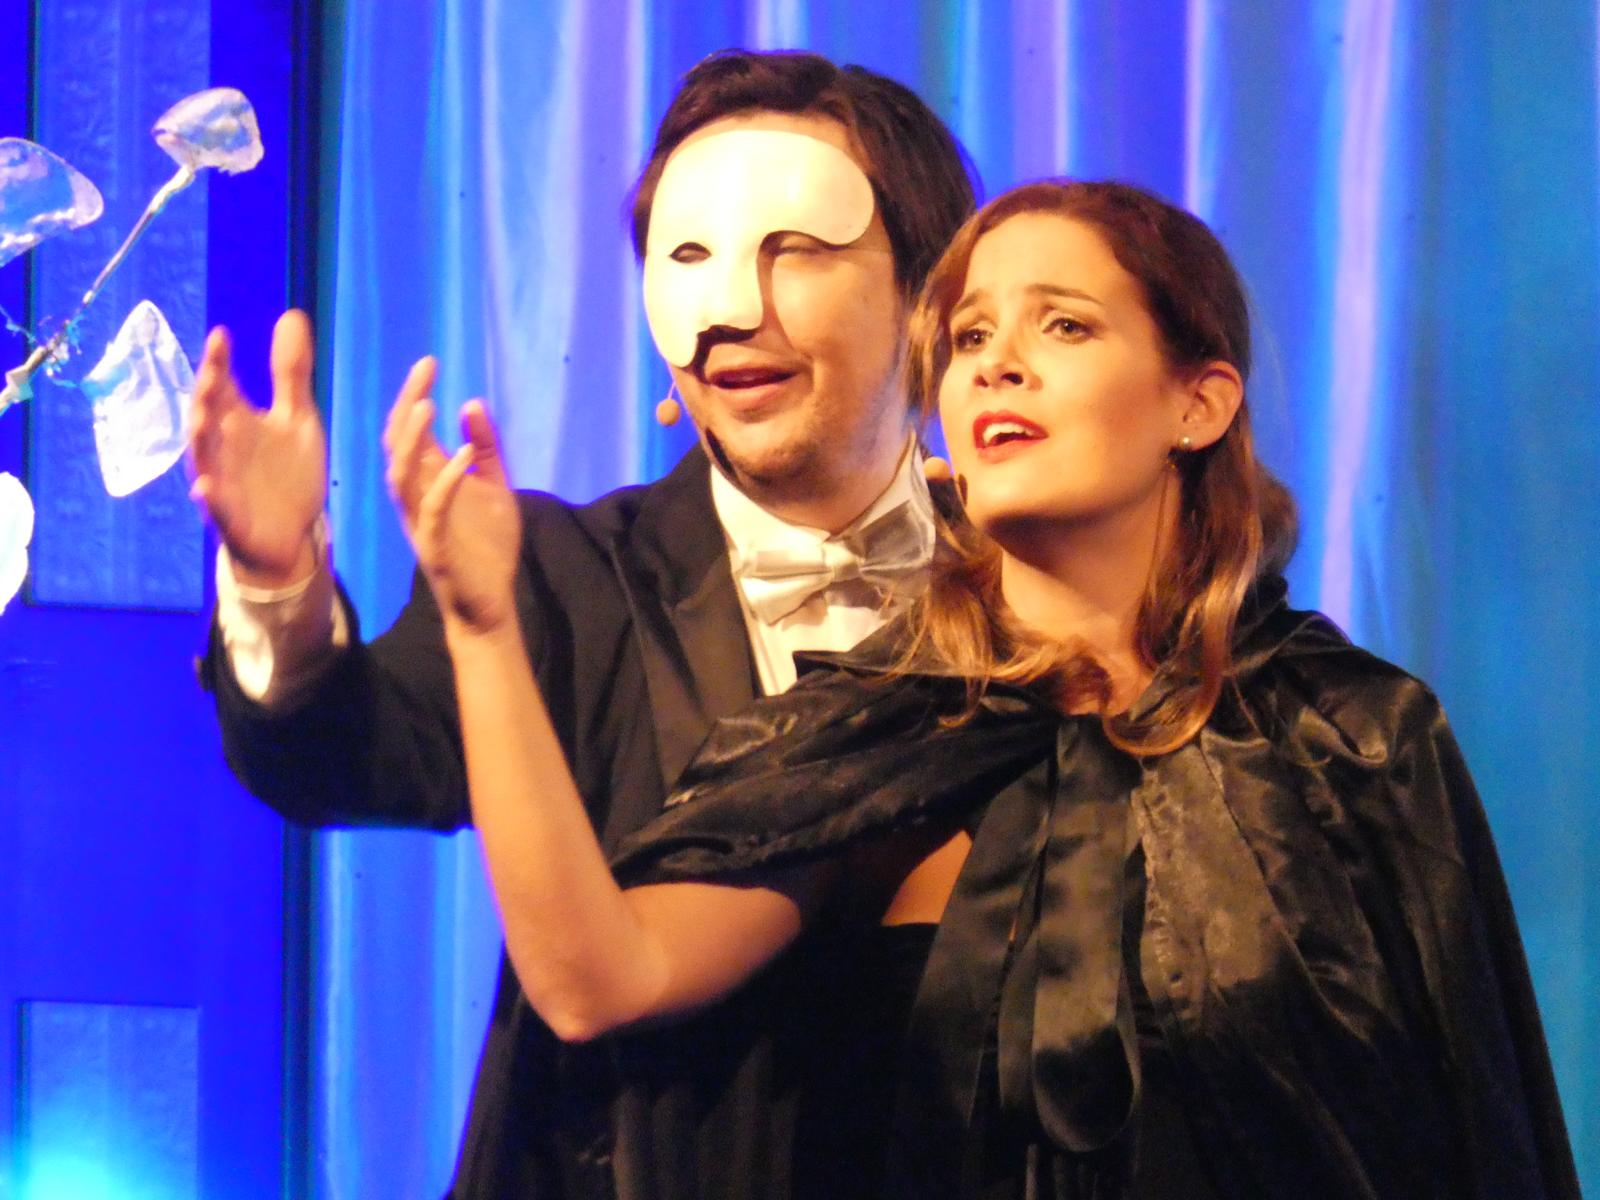 Armin Stöckl & Bernice Ehrlich